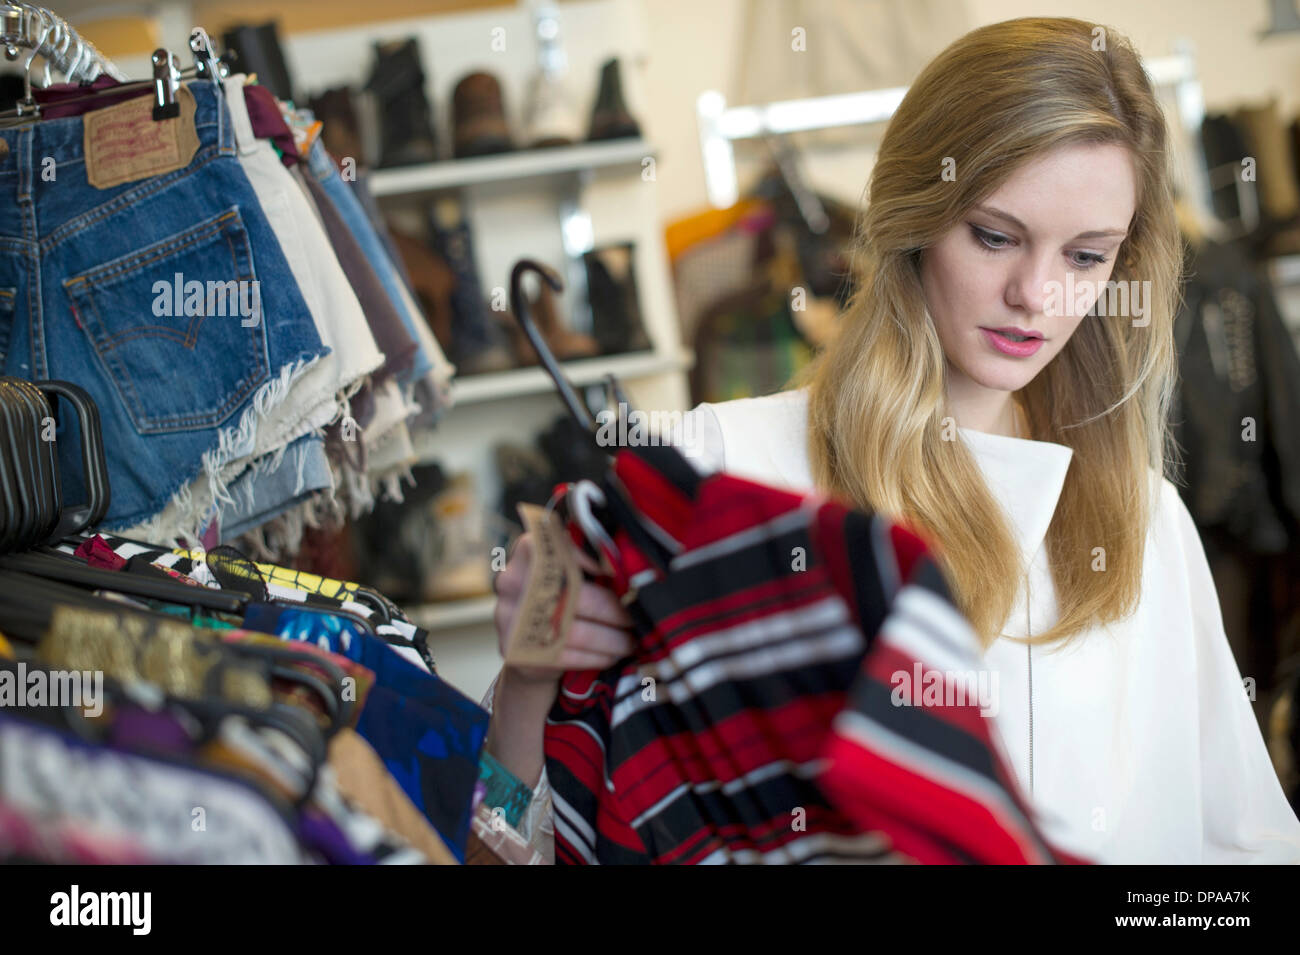 Mujer mirando su prenda superior Foto de stock